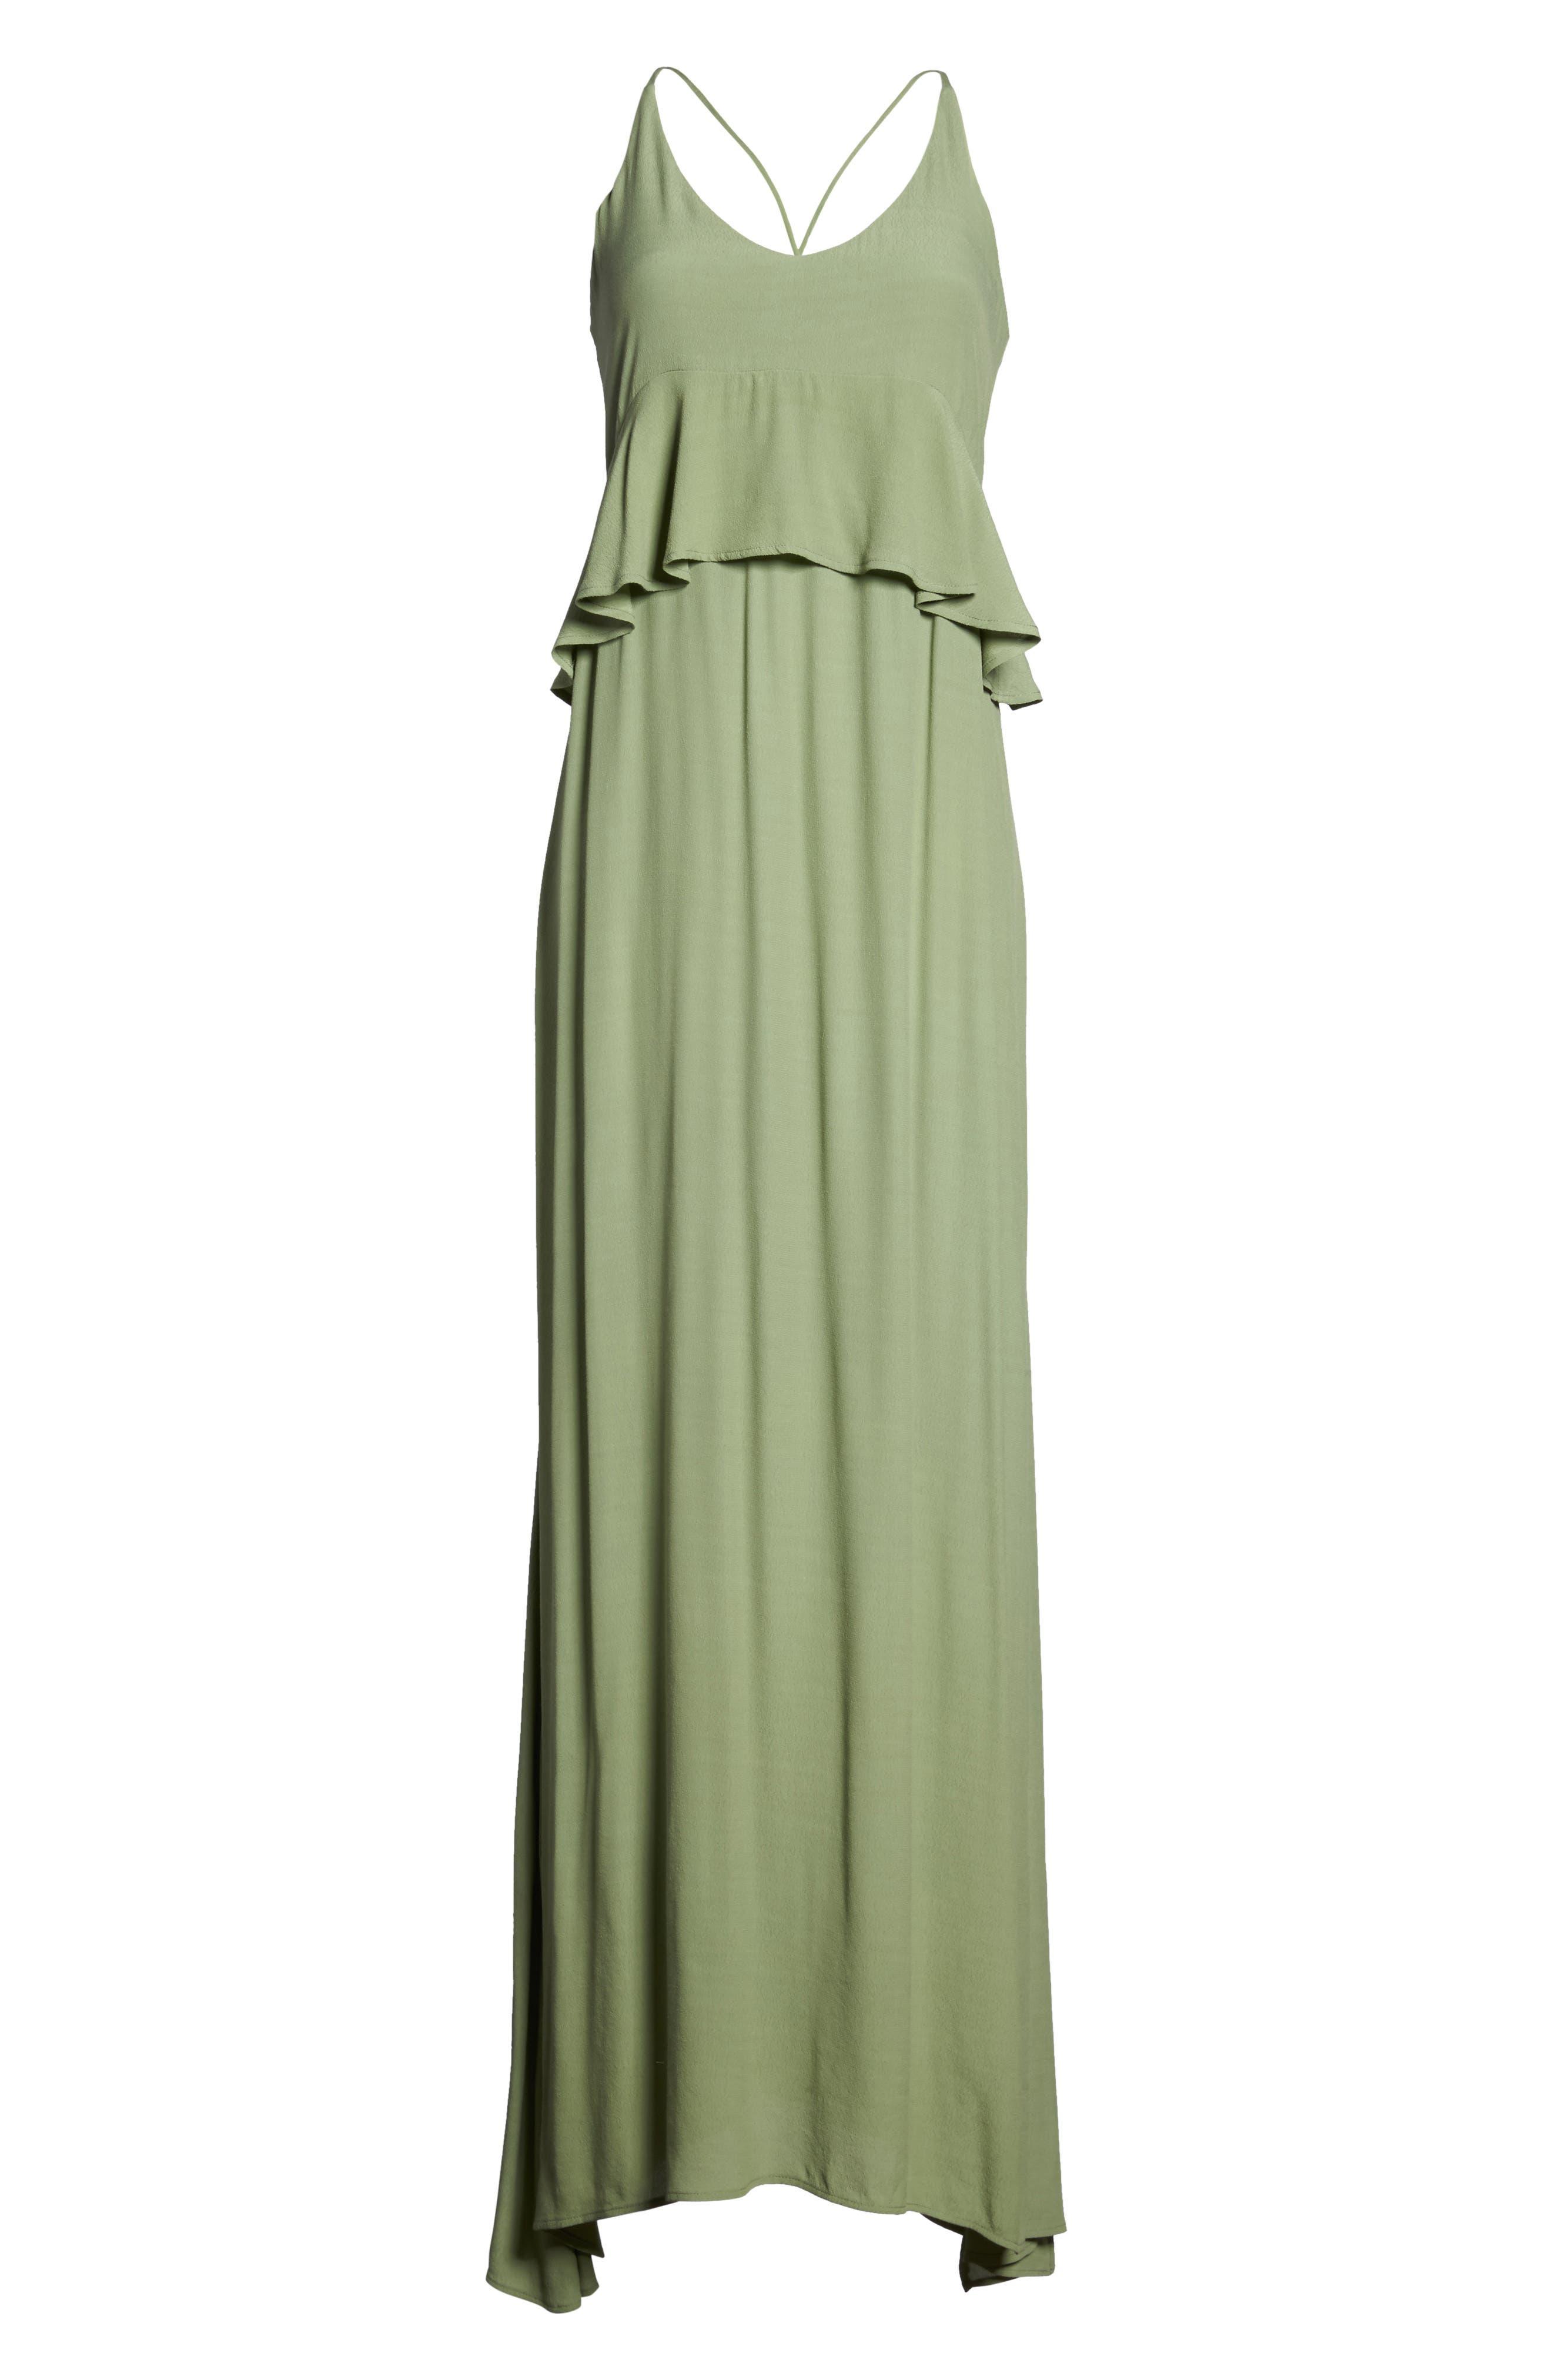 Roe + May Jolie Crepe Peplum Dress,                             Alternate thumbnail 6, color,                             Sage